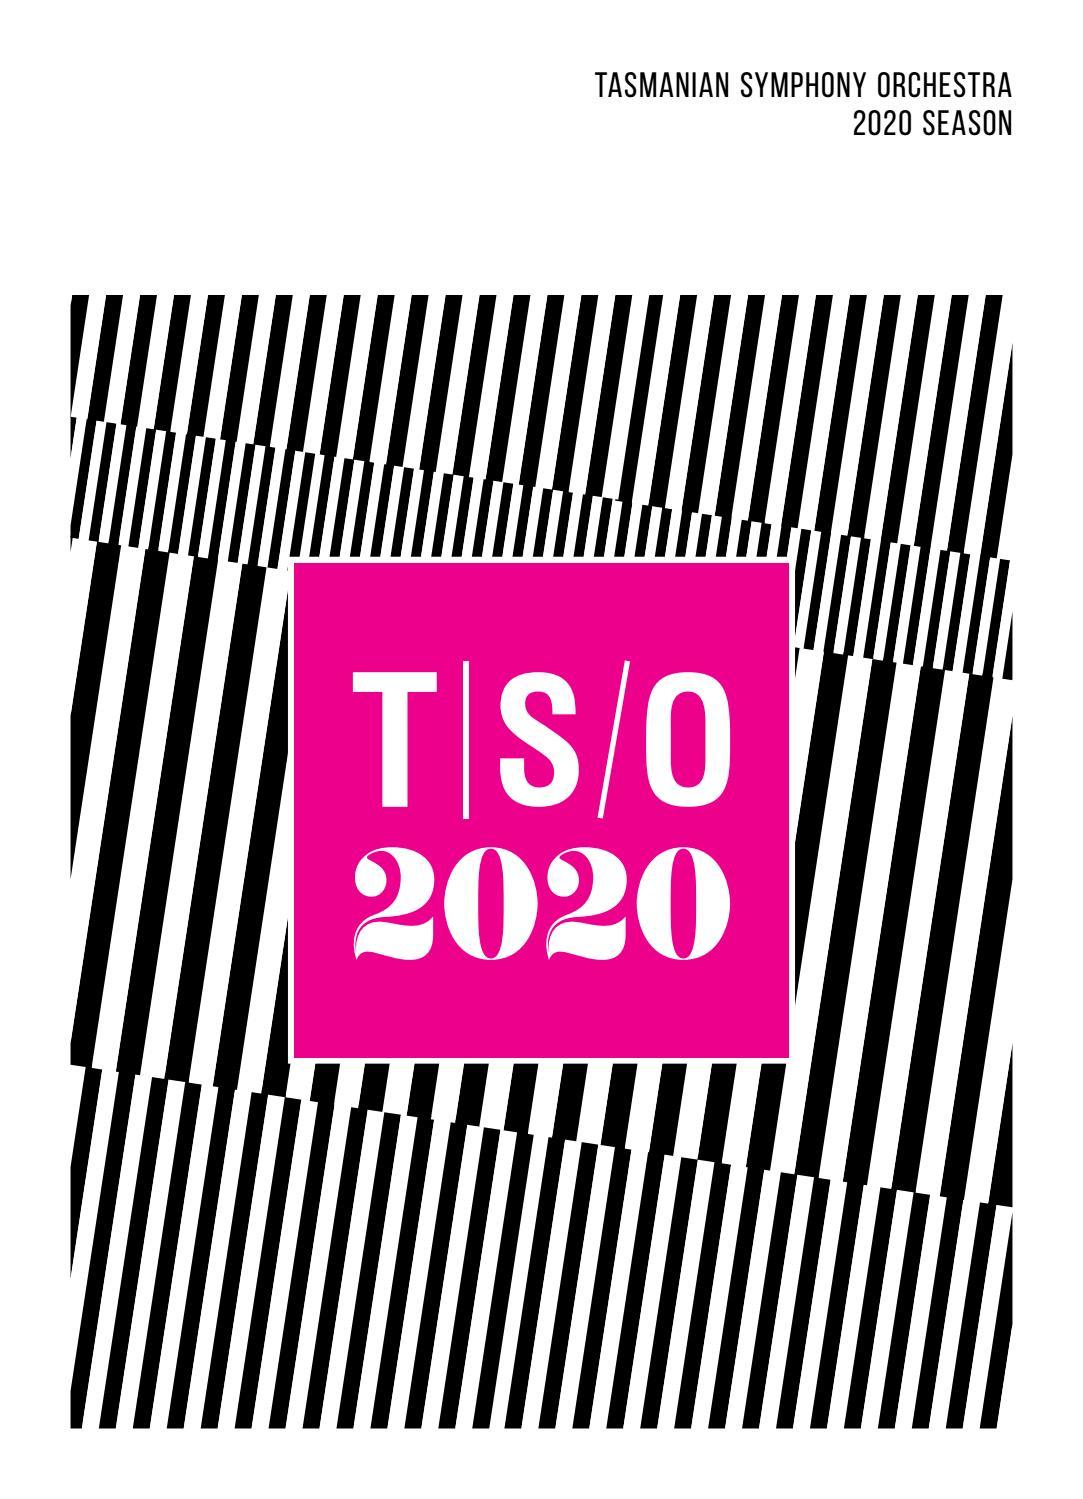 Tso Tour 2020.Tso 2020 Season By Tasmanian Symphony Orchestra Issuu